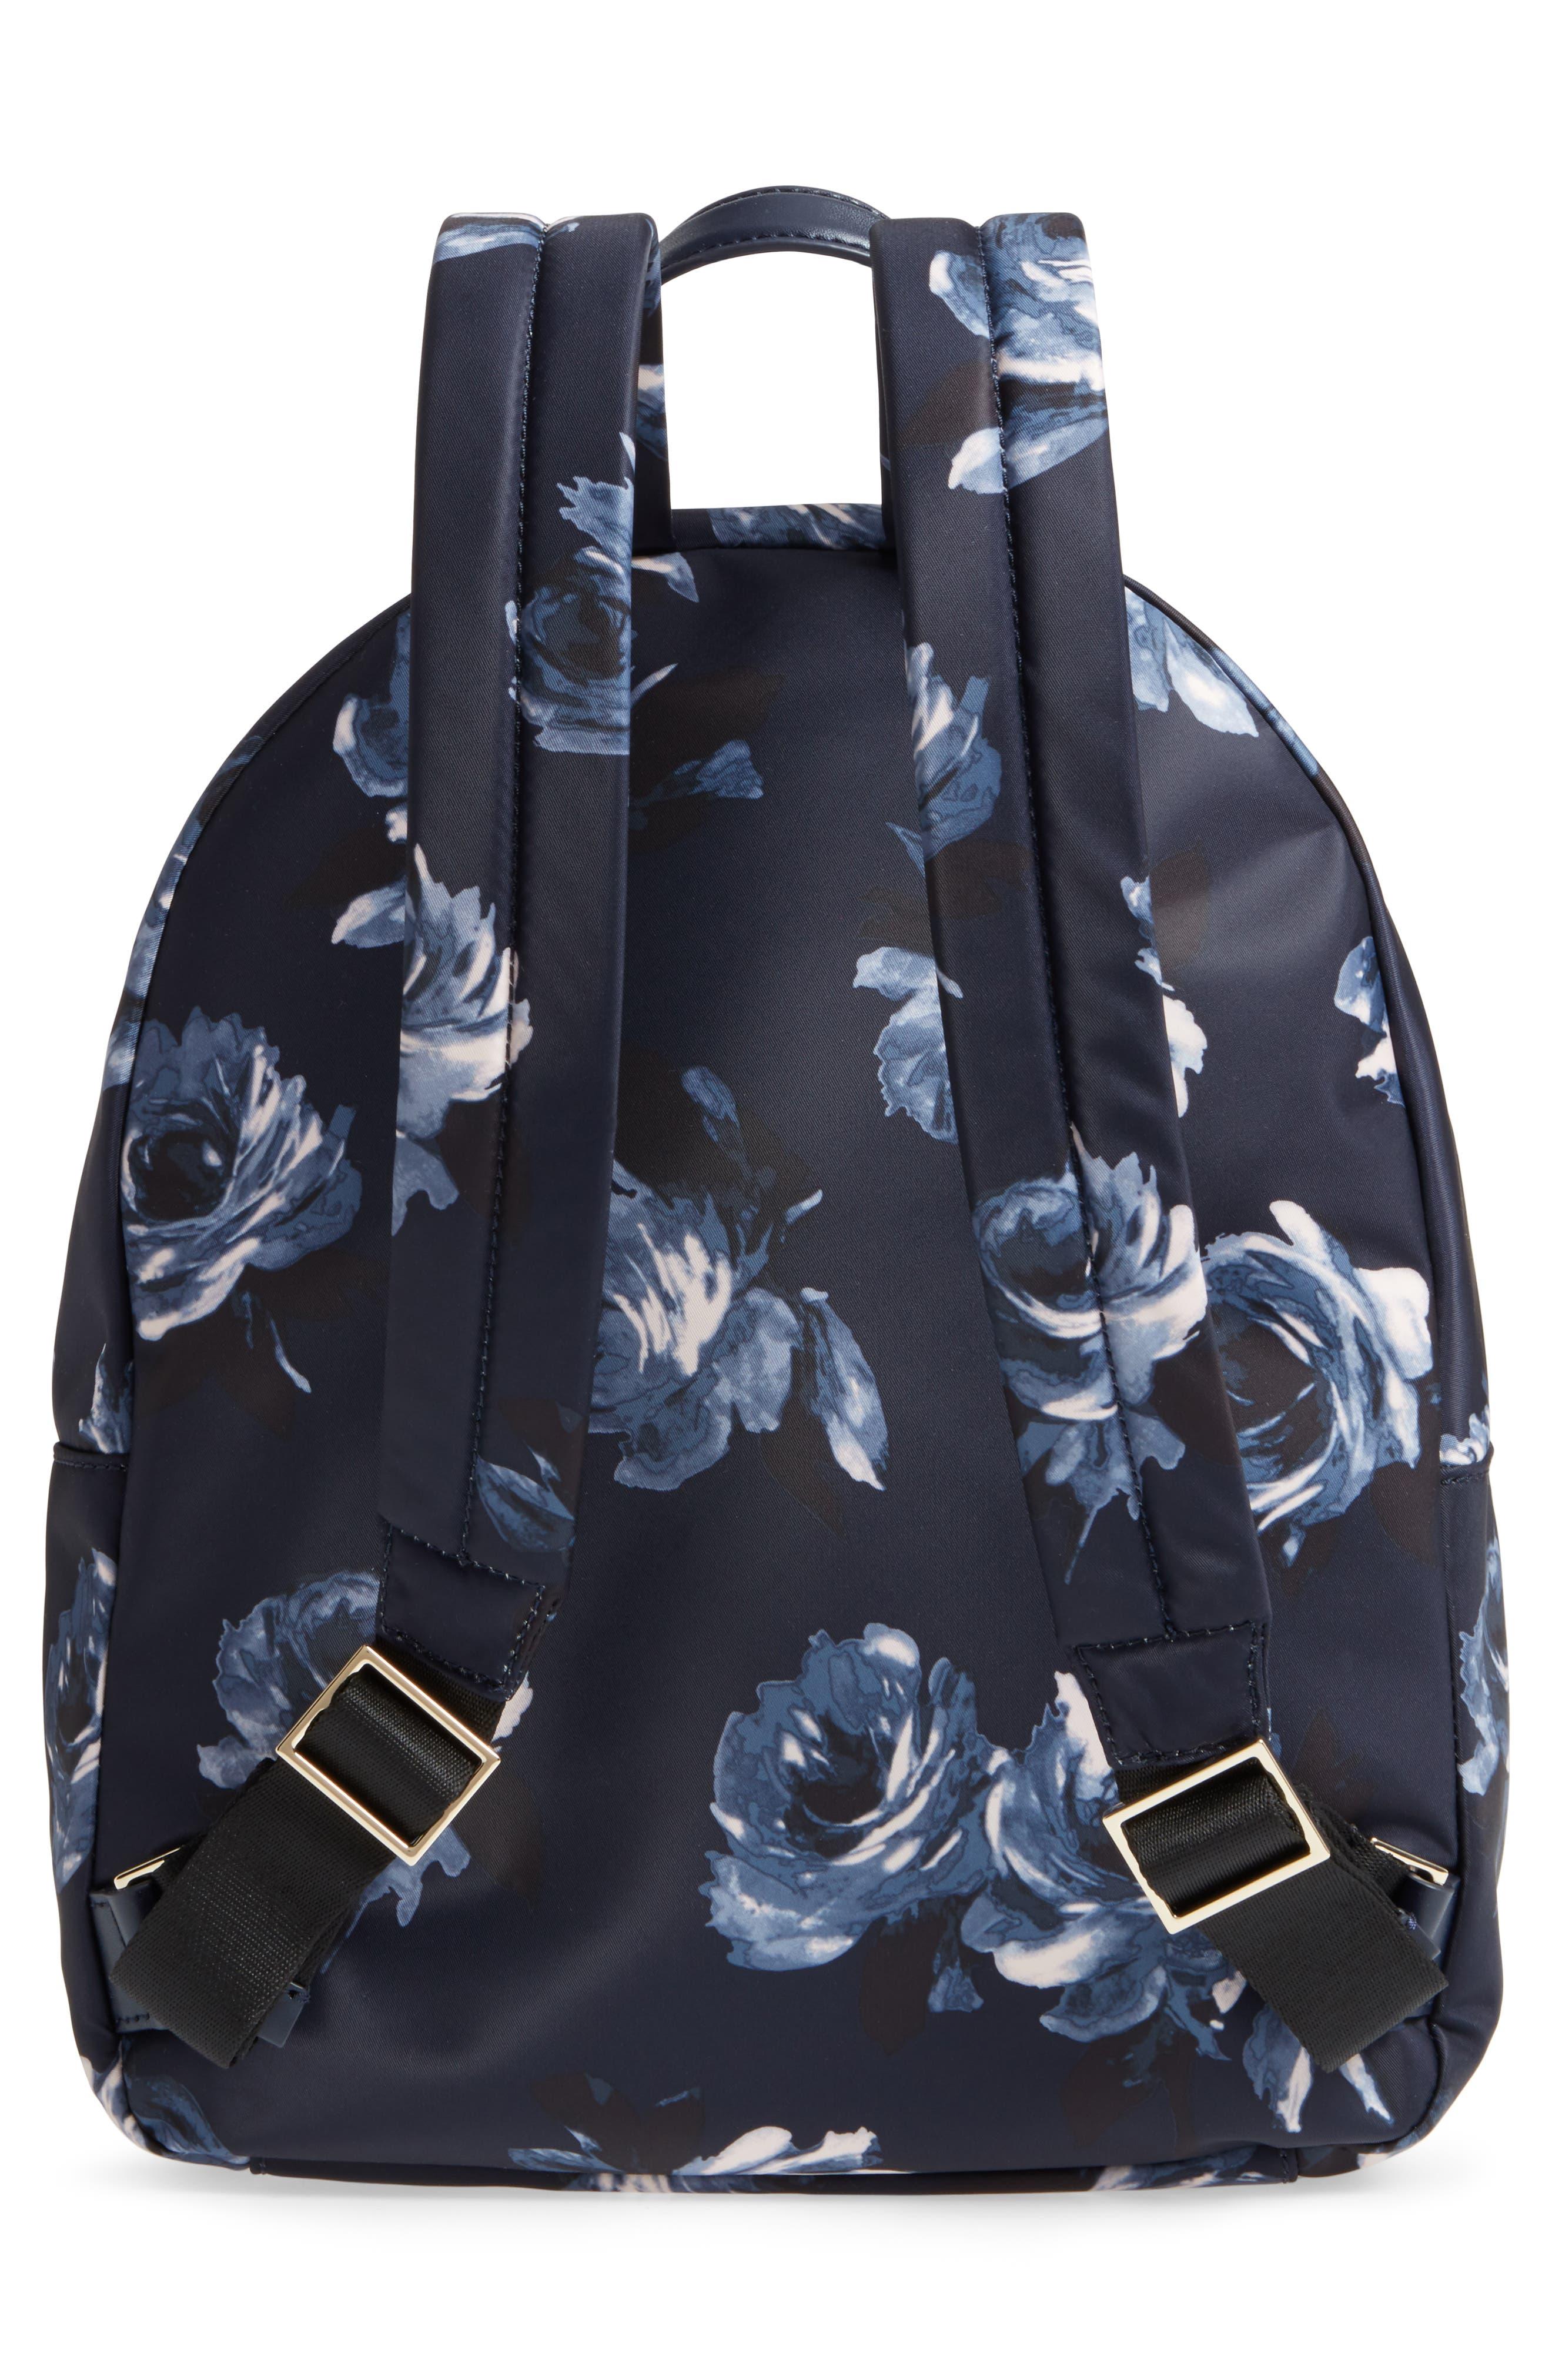 watson lane night rose hartley nylon backpack,                             Alternate thumbnail 3, color,                             Night Rose